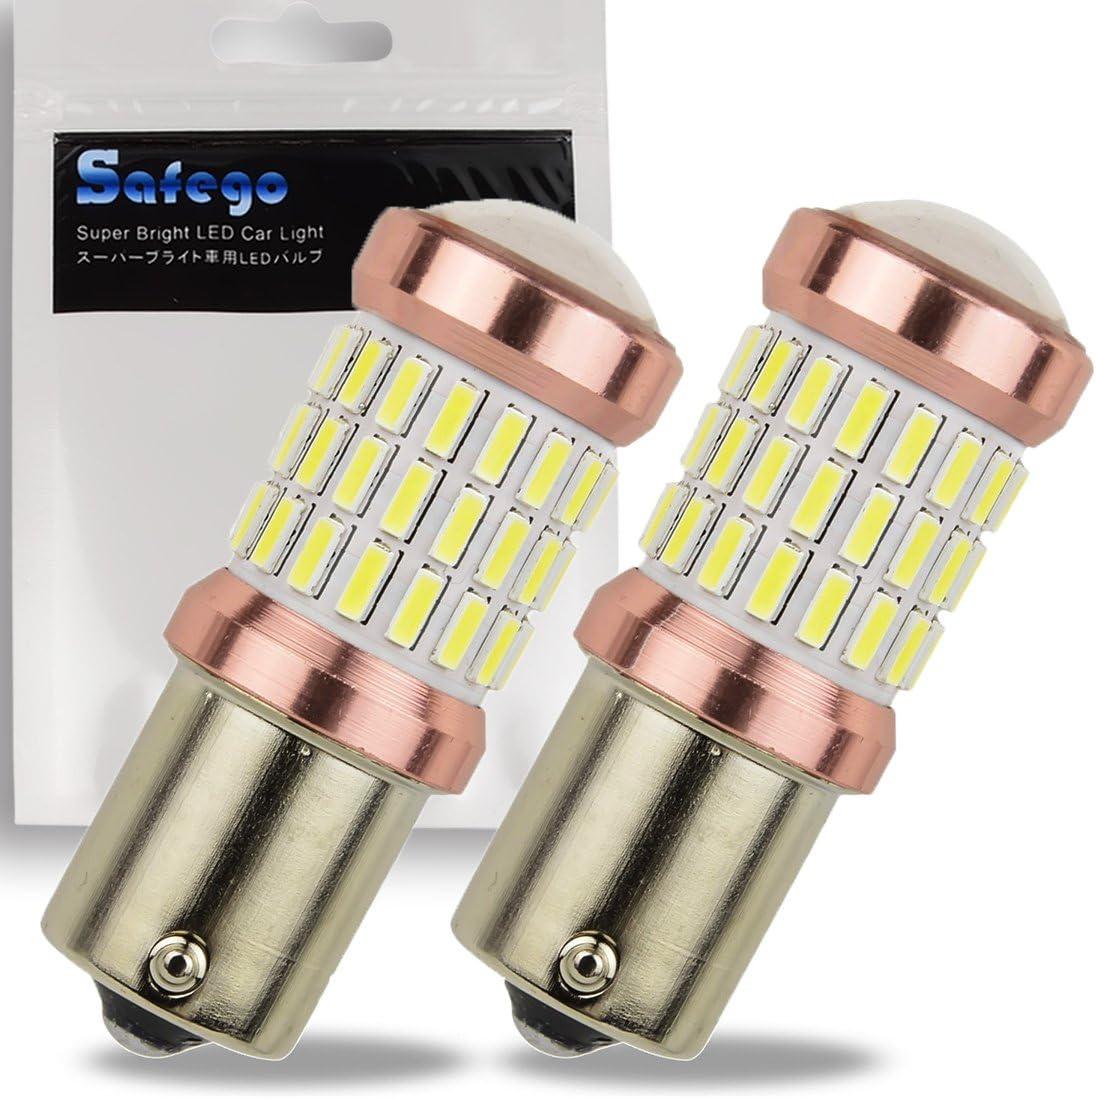 Safego – Bombilla de luz LED blanca P21W 6000K, 1141, superbrillantes de 12 V, 1156 BA15S para faros laterales de luz direccional del coche, 2 unidades